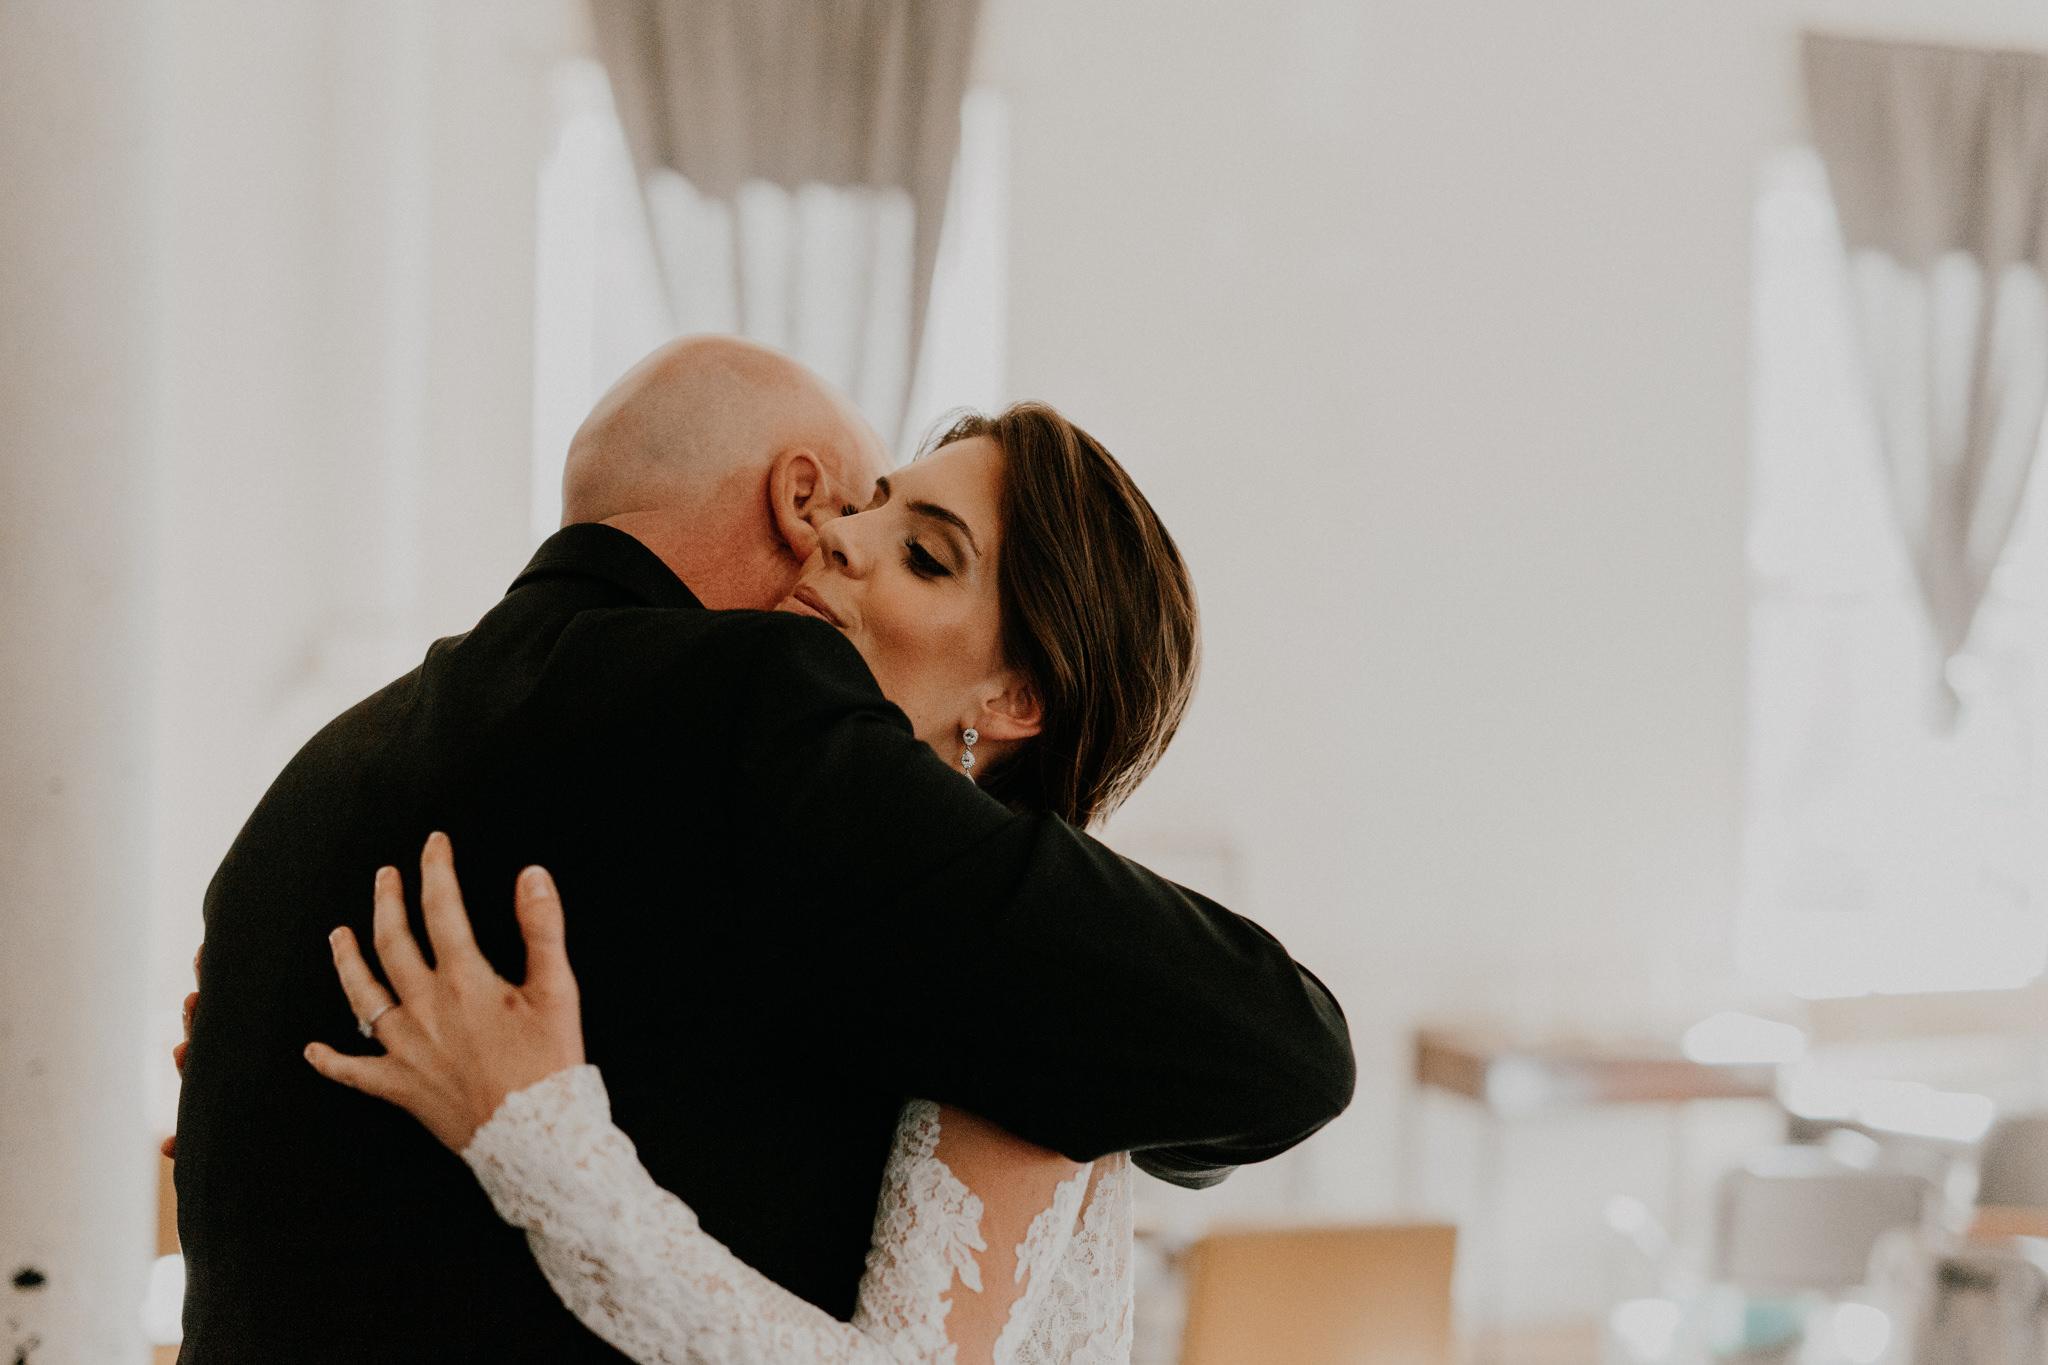 wedding-headlands-center-for-the-arts-sausalito-55.jpg